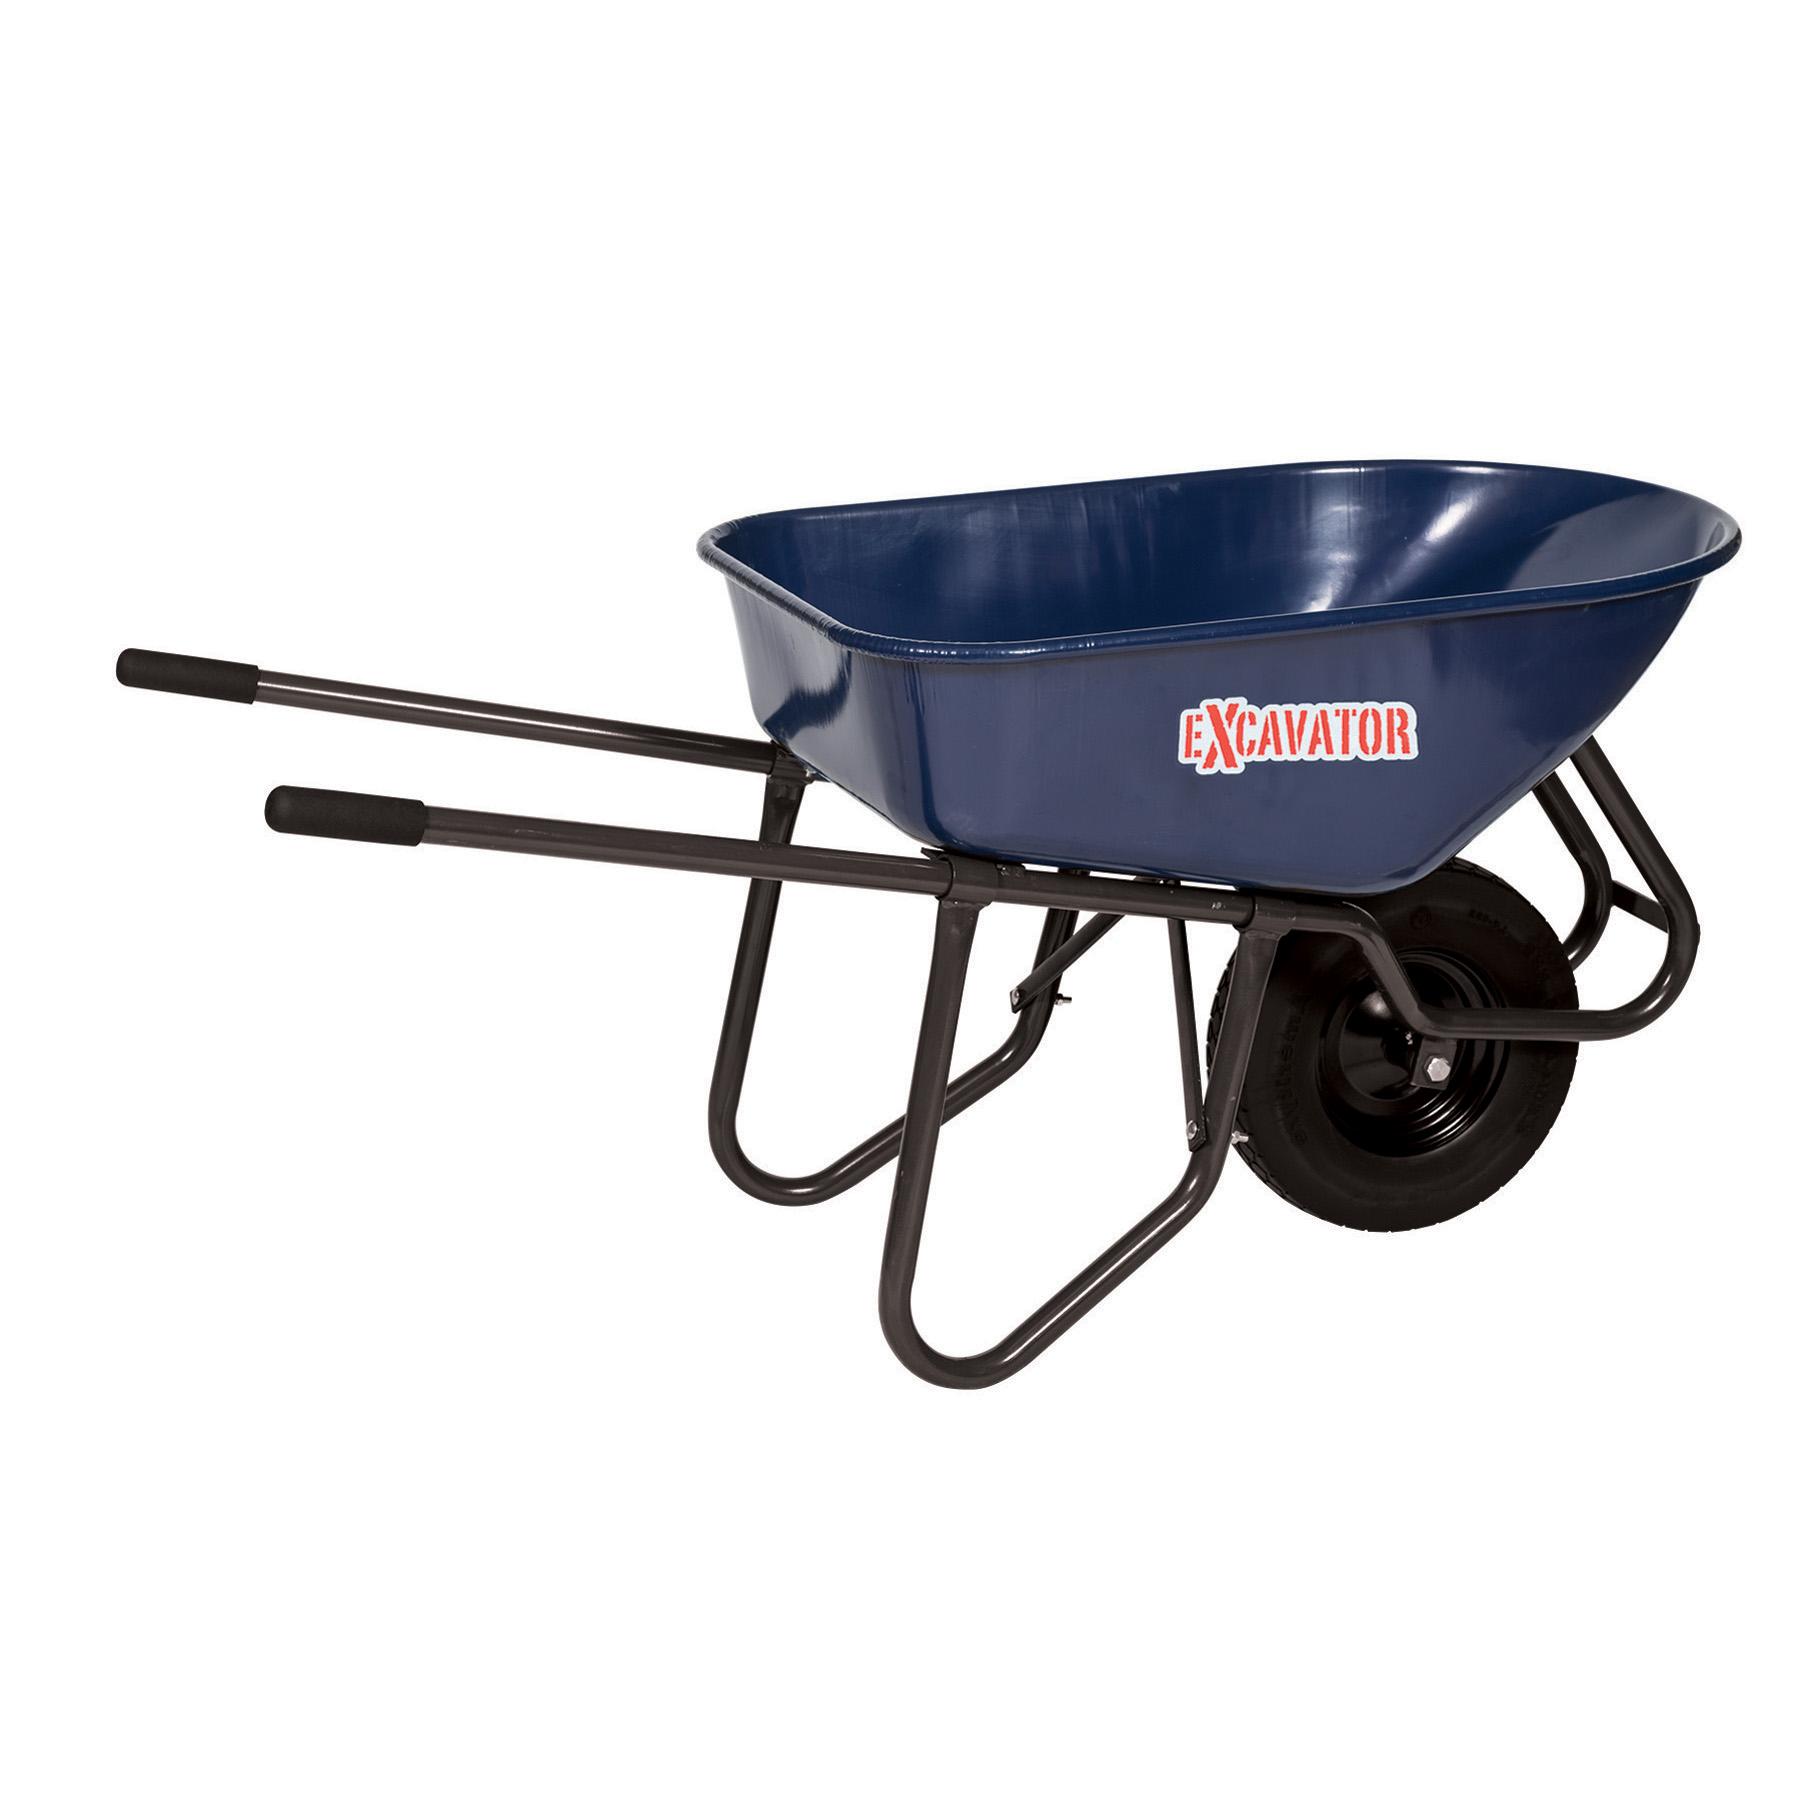 Seymour Excavator 6 Cu Ft Wheelbarrow Steel Tray